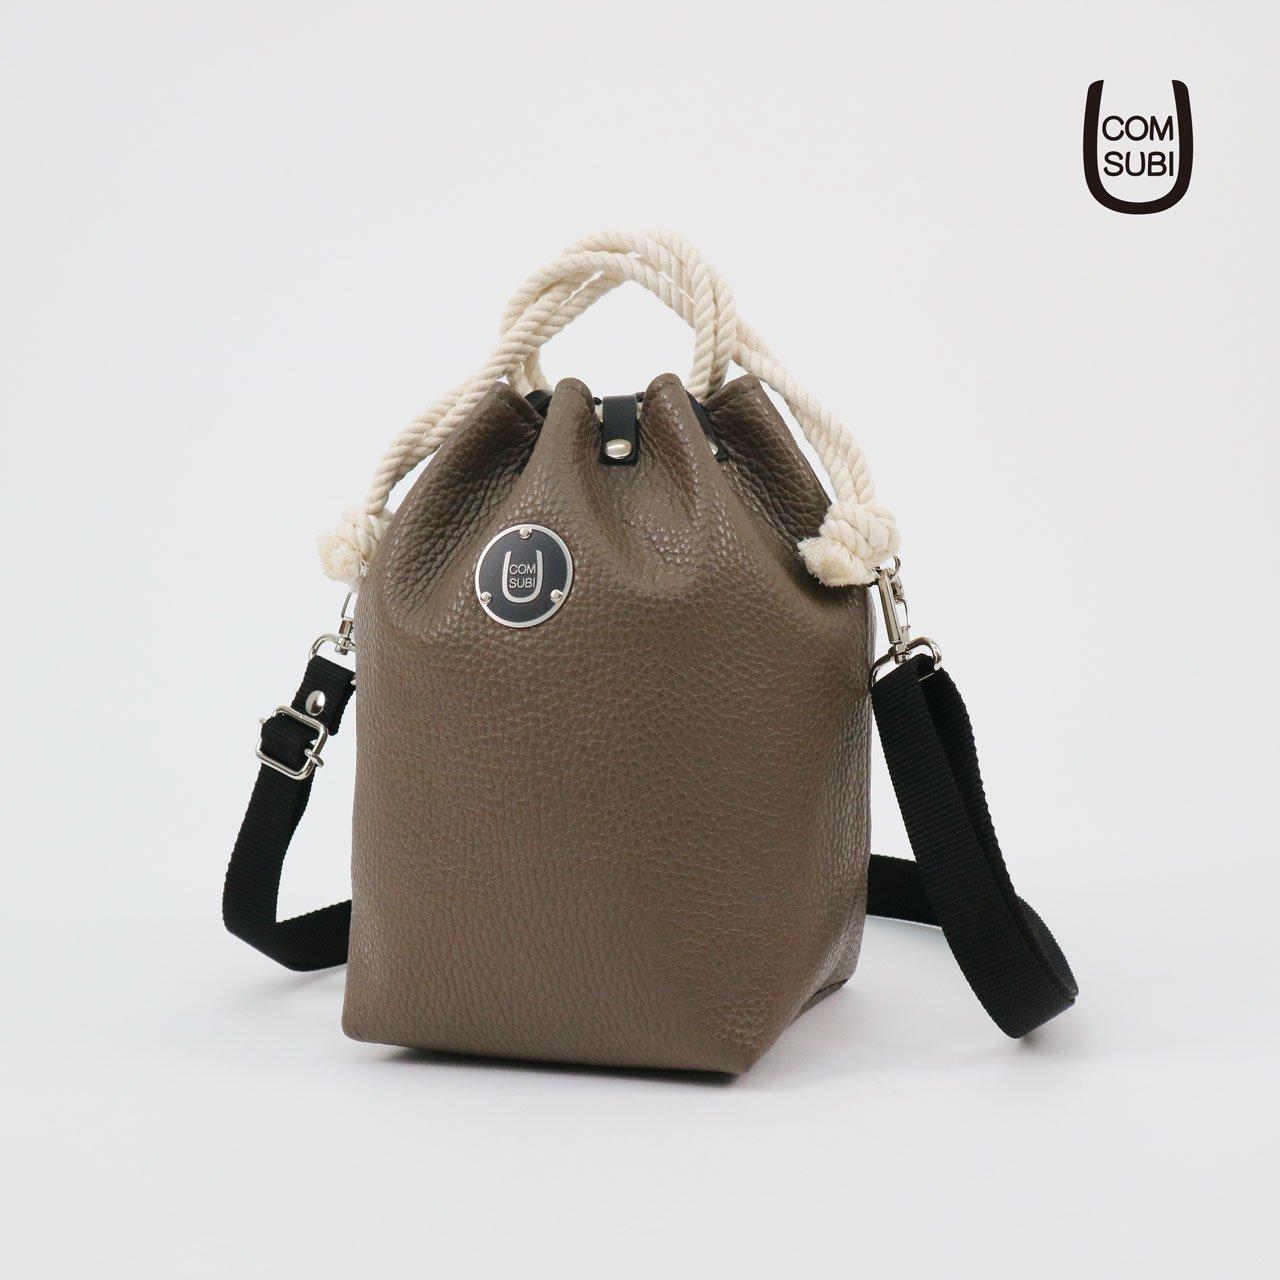 "COMUSUBI BAG  ""Leather"" -Elephant-"